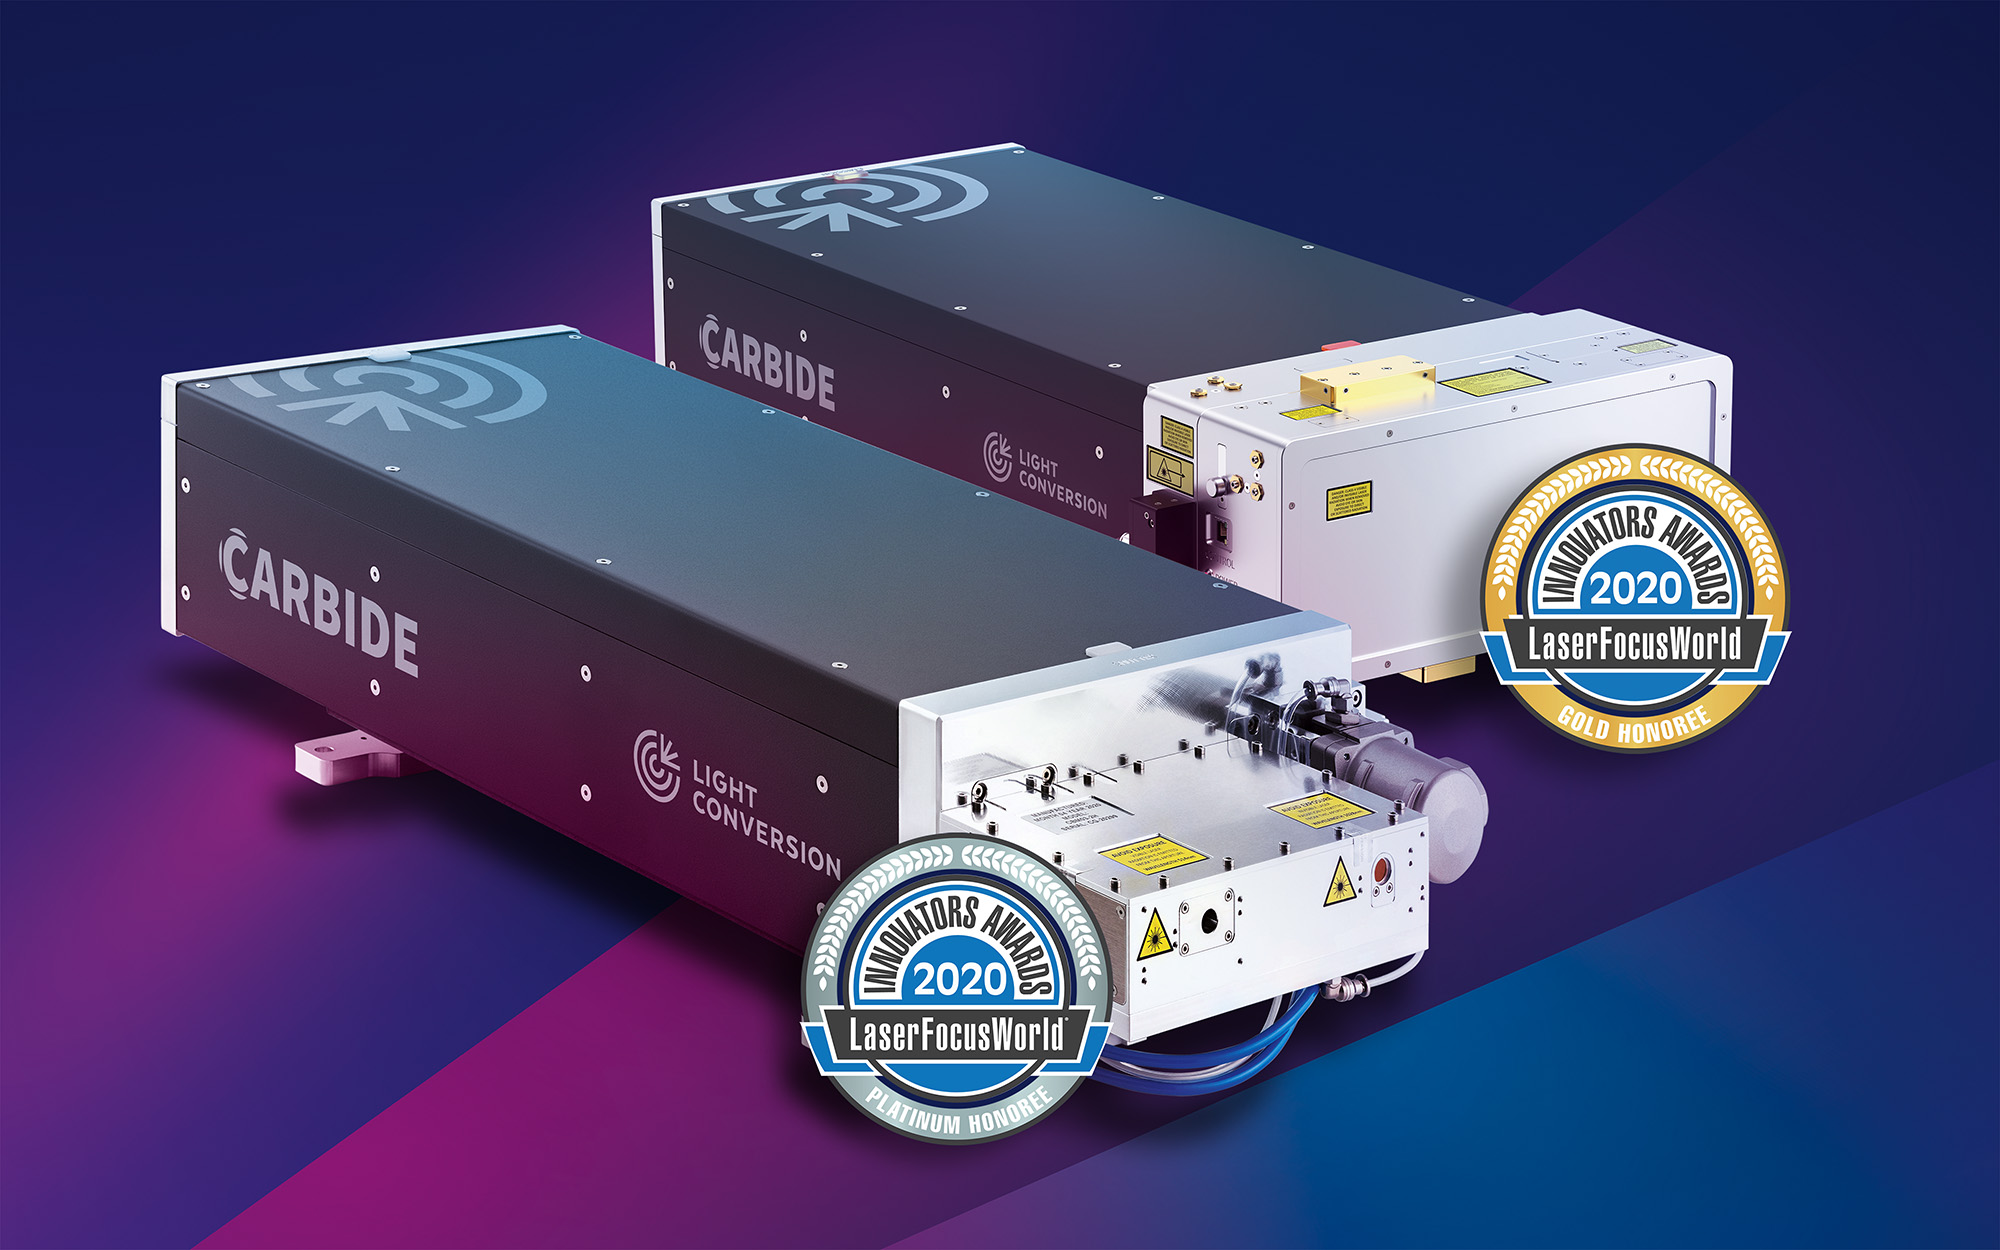 Carbide-CB3-laser-focus-world-award.jpg (421 KB)